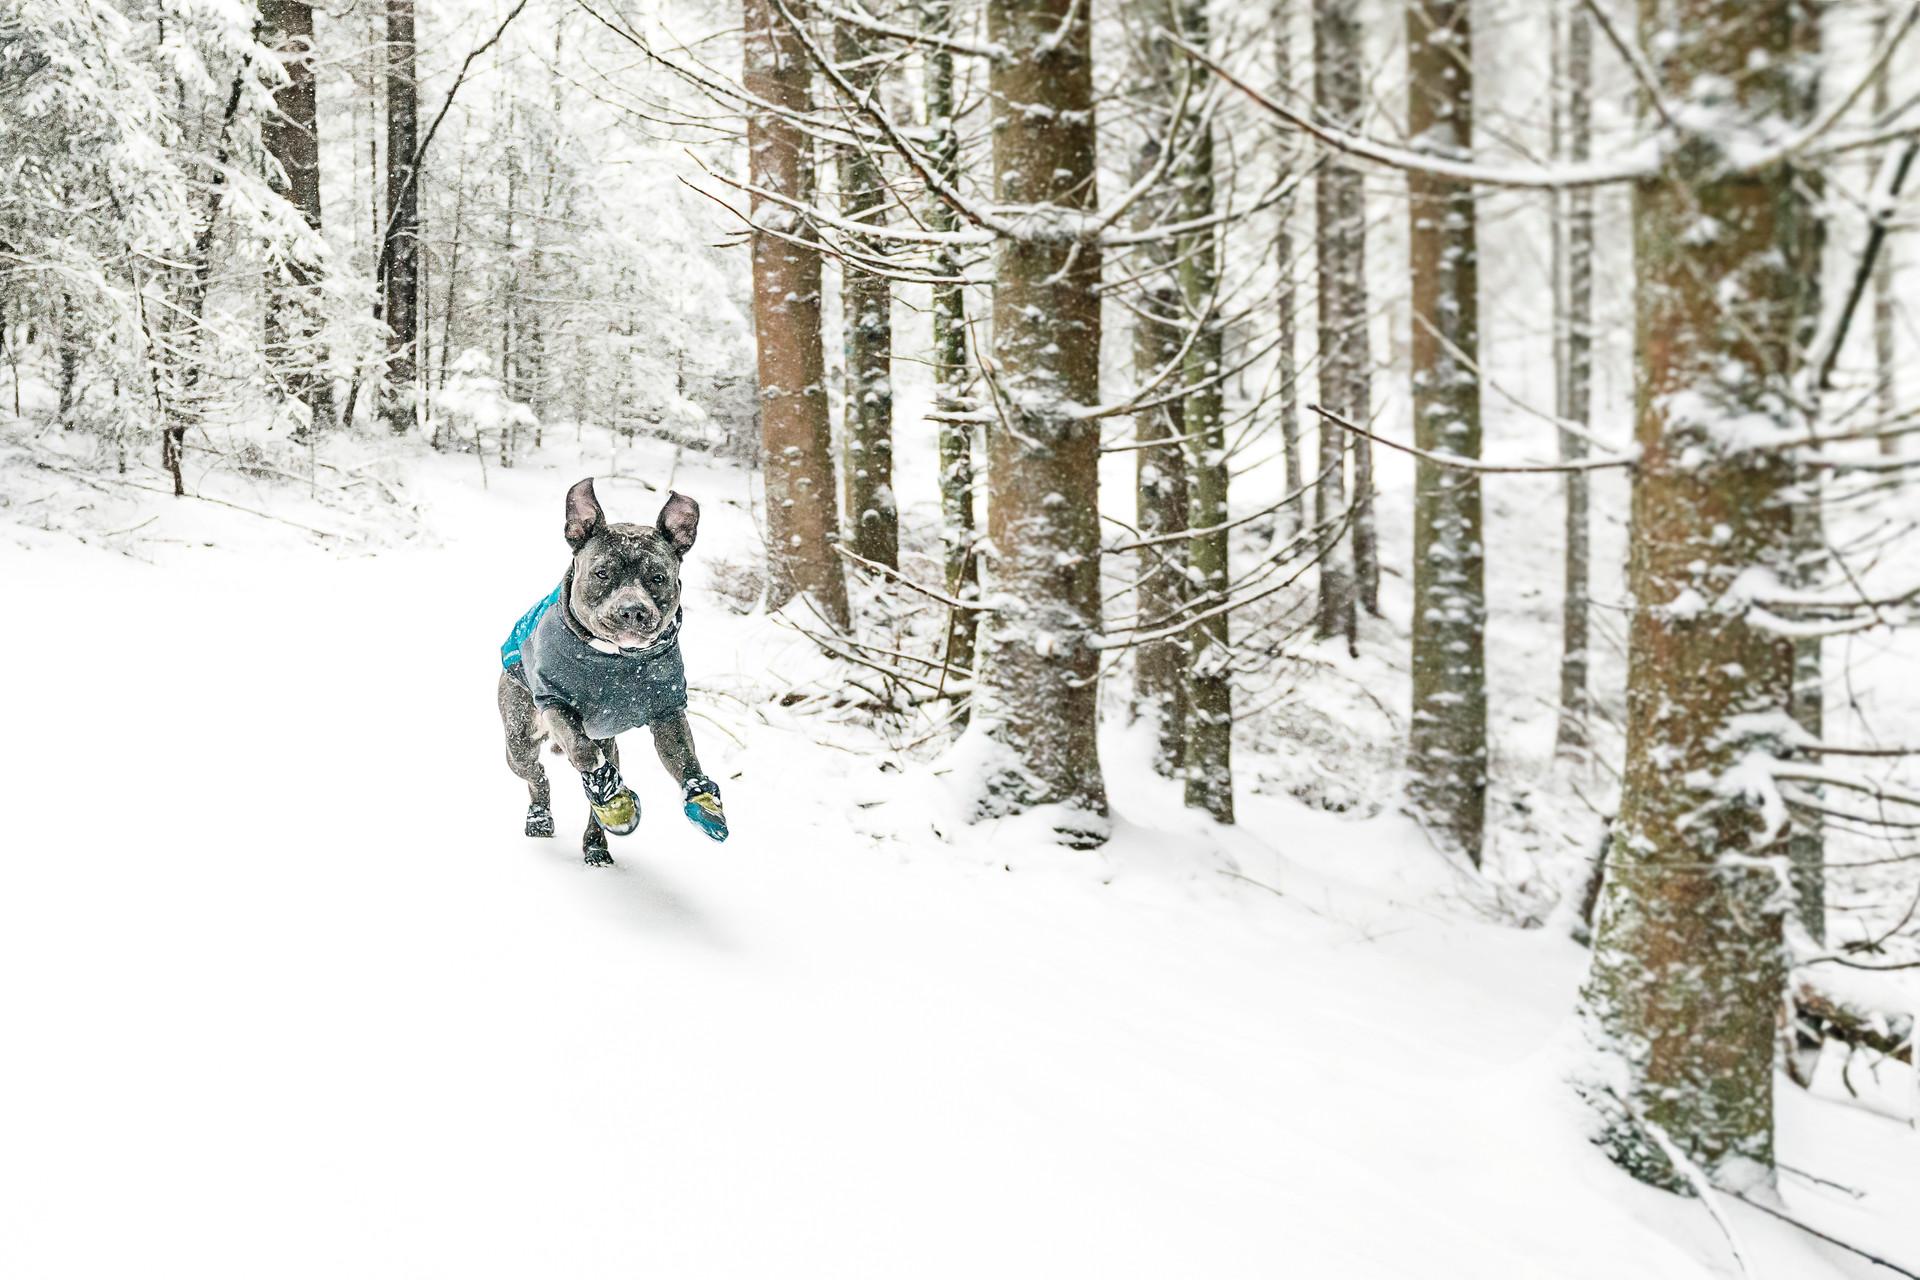 Wohooow-ruff, I likilike that snow boss!